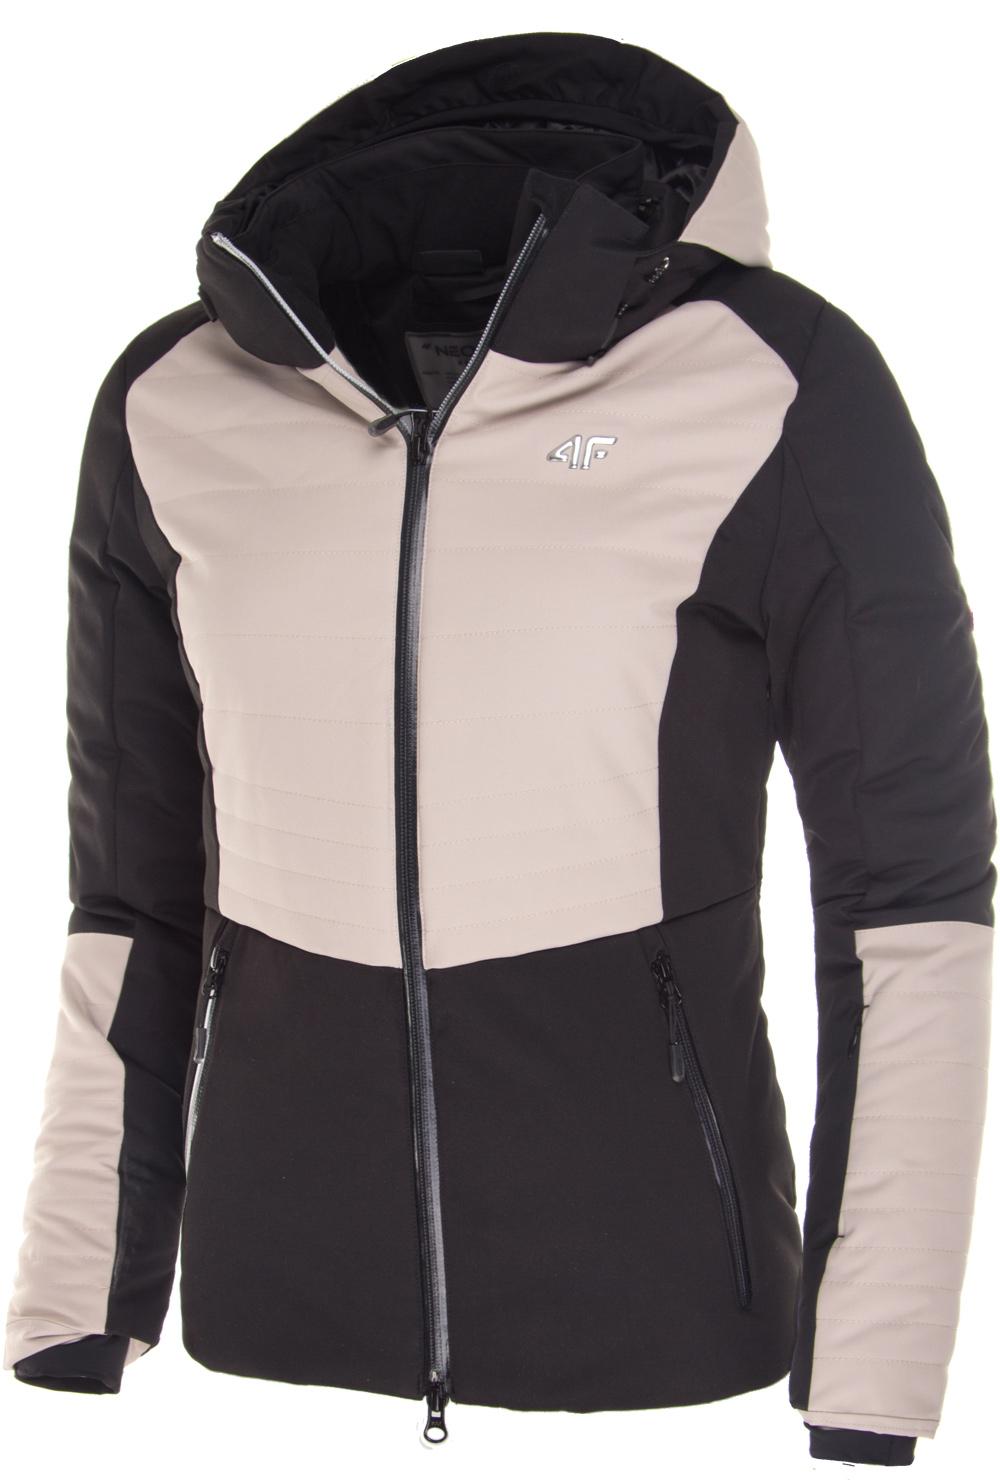 Lyžařská bunda dámská 4F - KUDN008